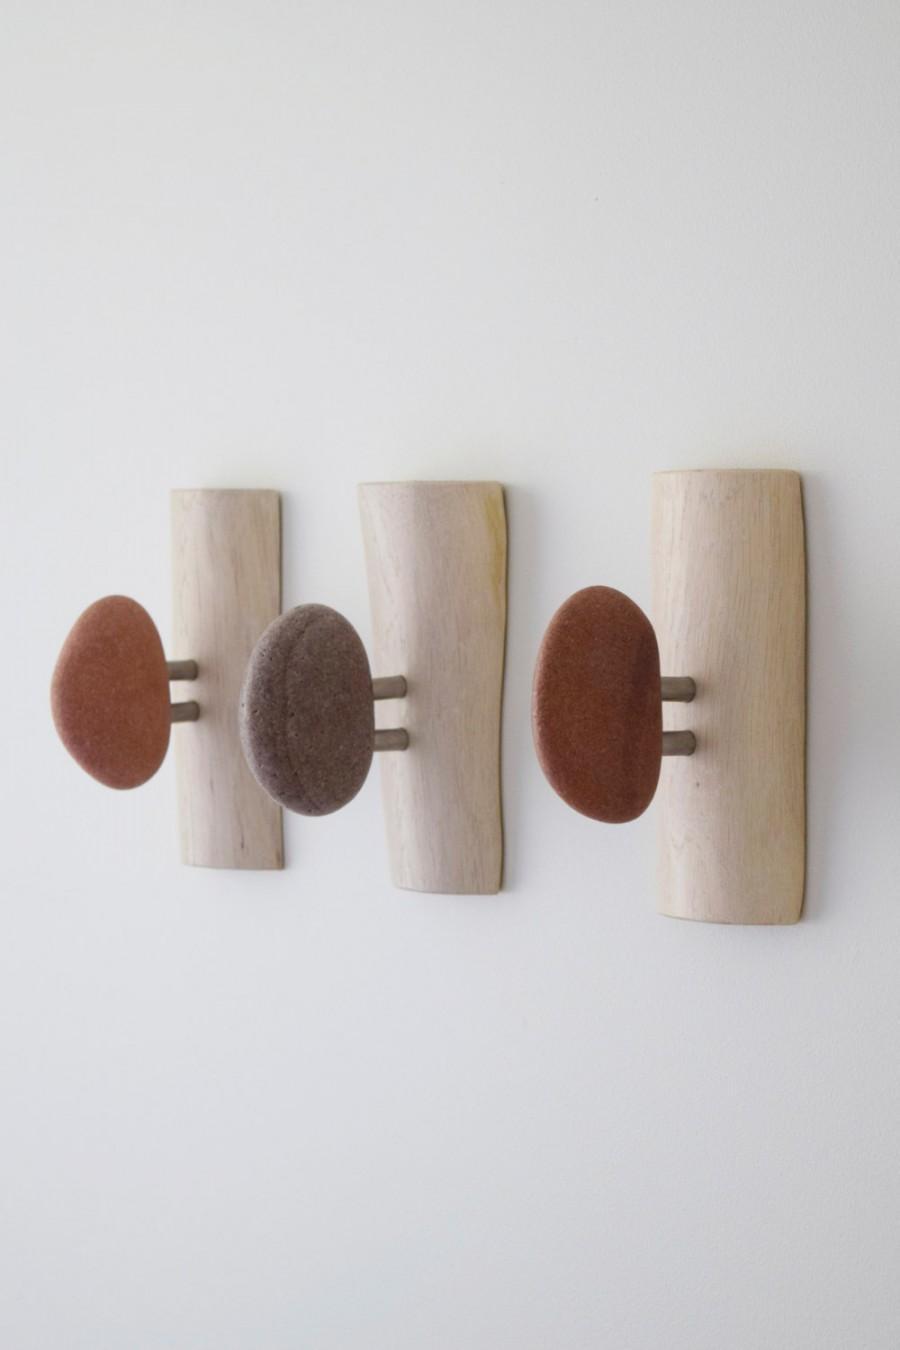 Stone Hooks Towel Bathroom Wall